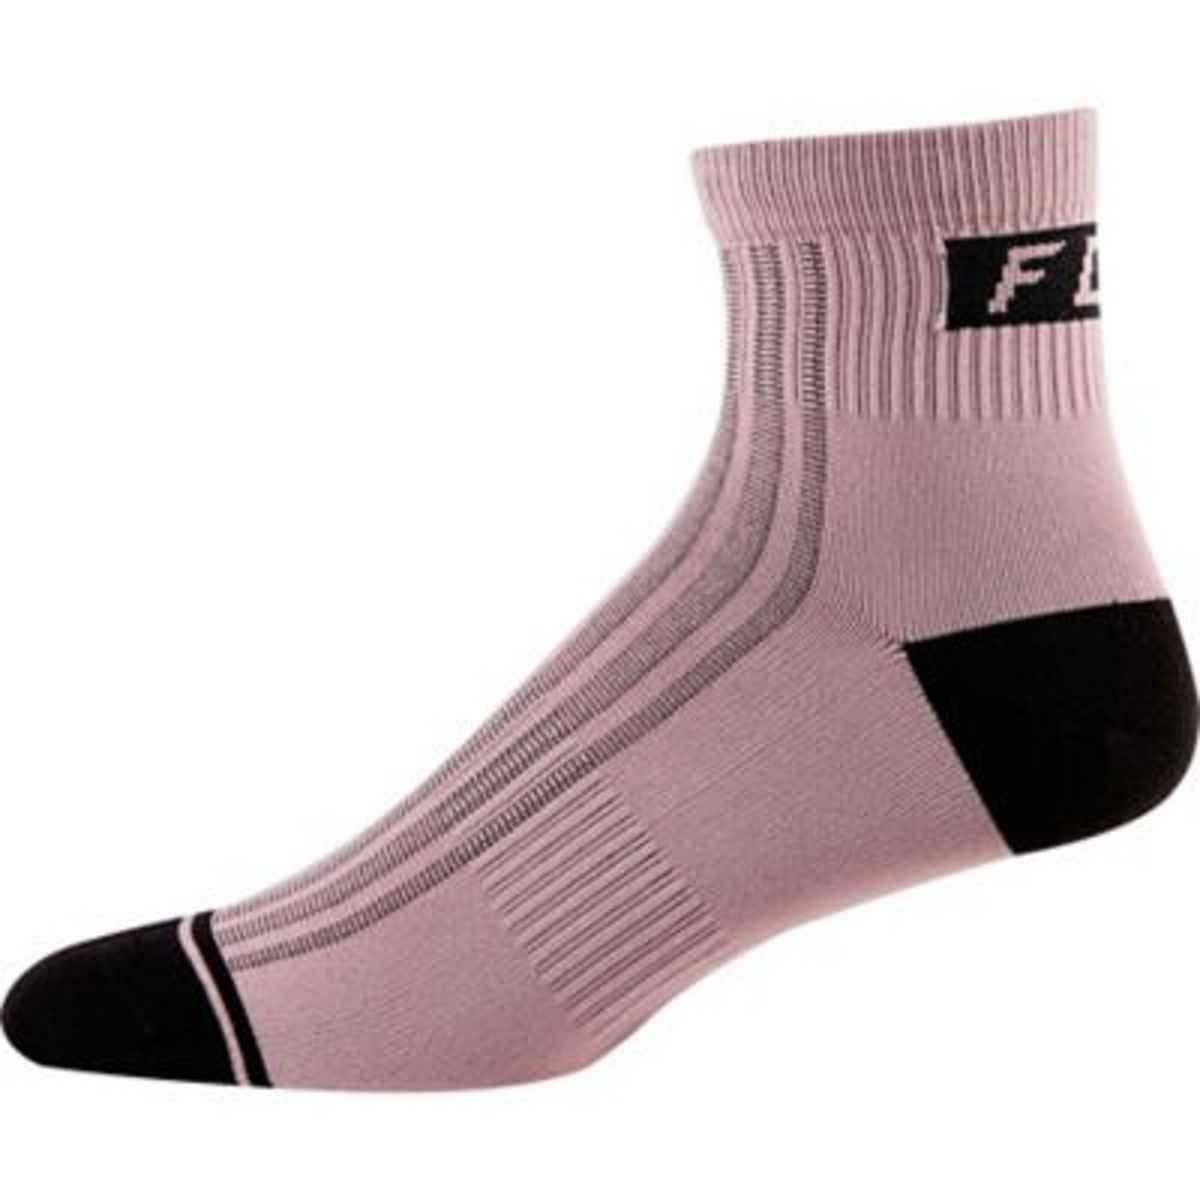 20947 Fox Racing 4 Sock